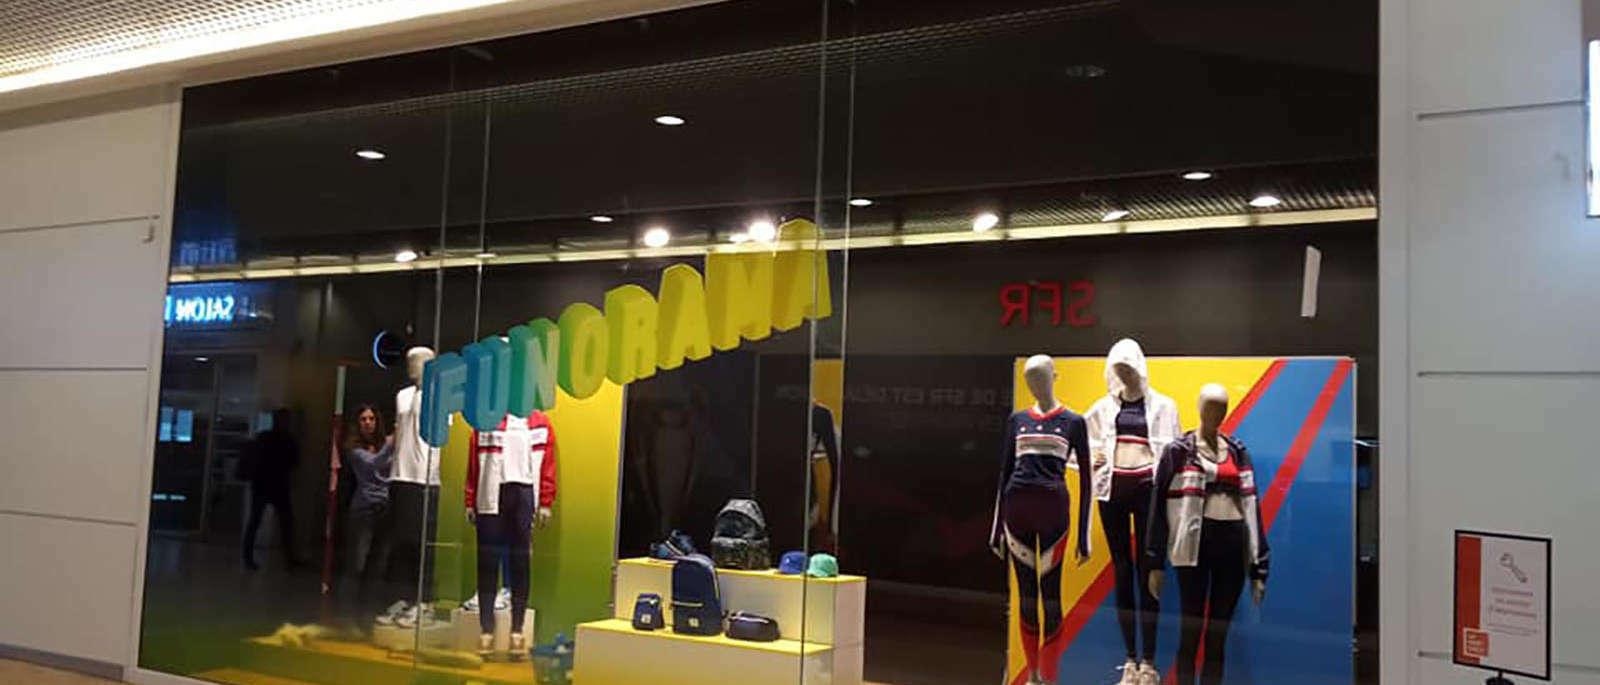 decoration vitrine magasin